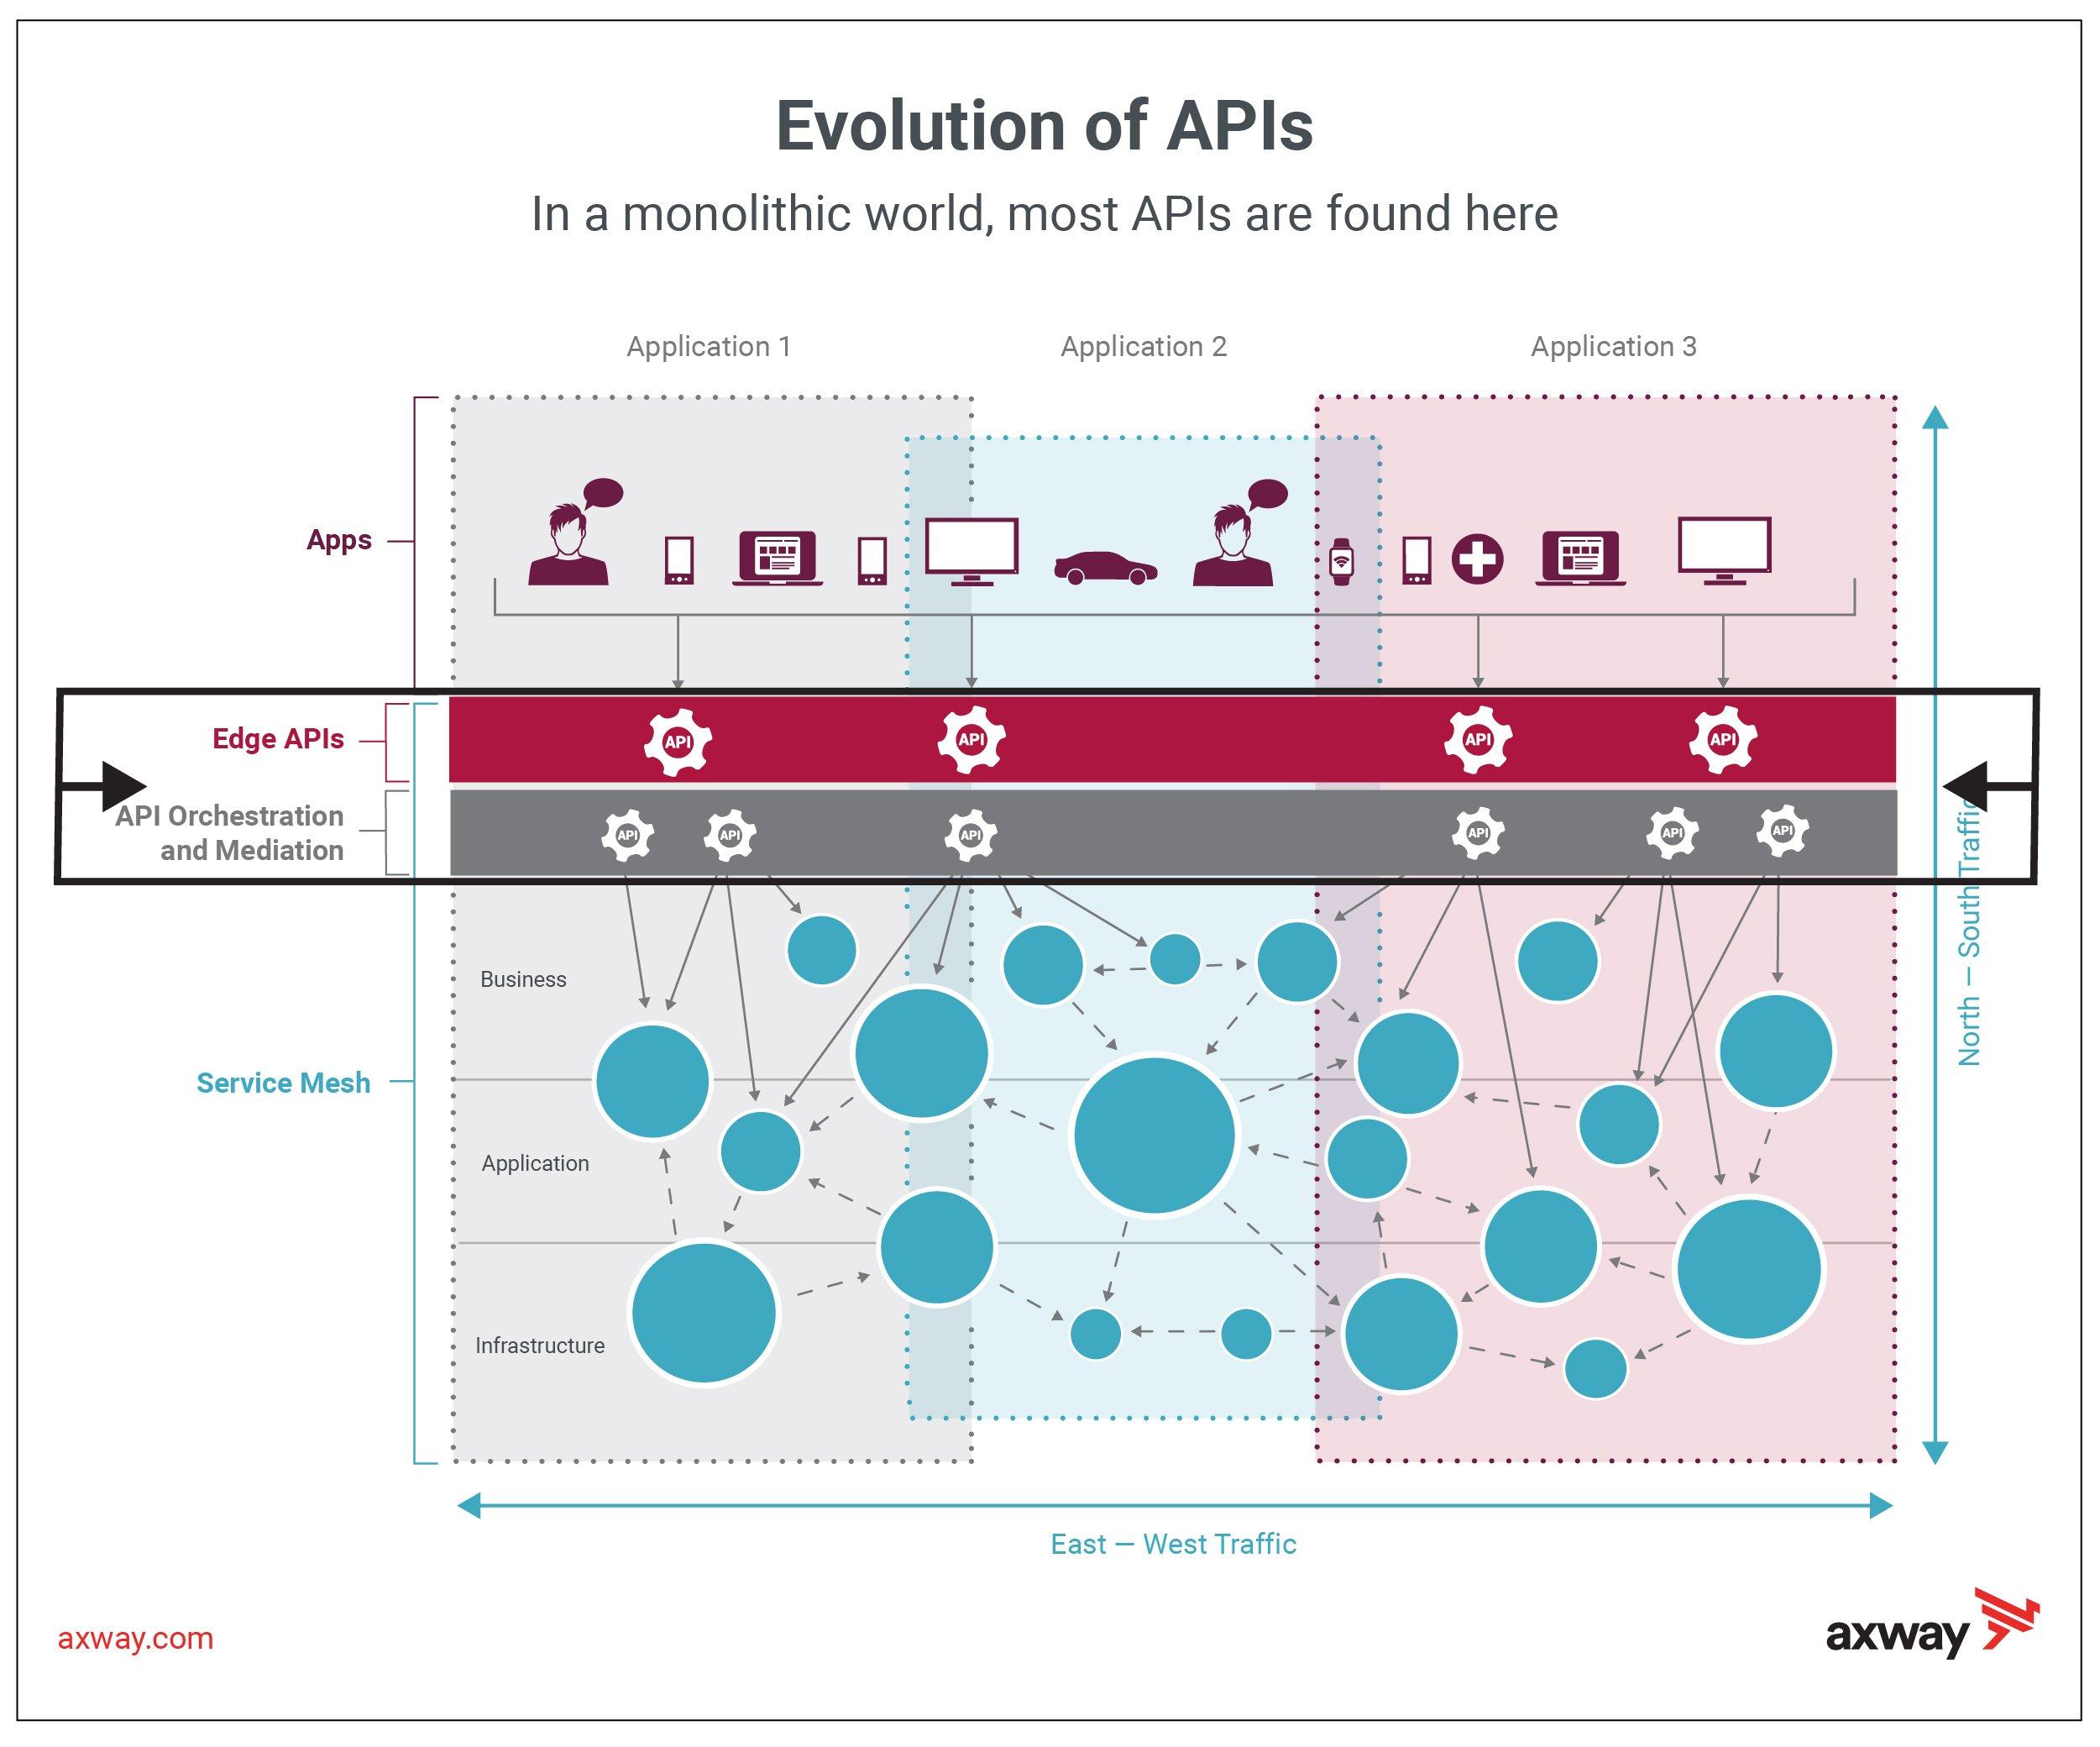 Evolution of APIs